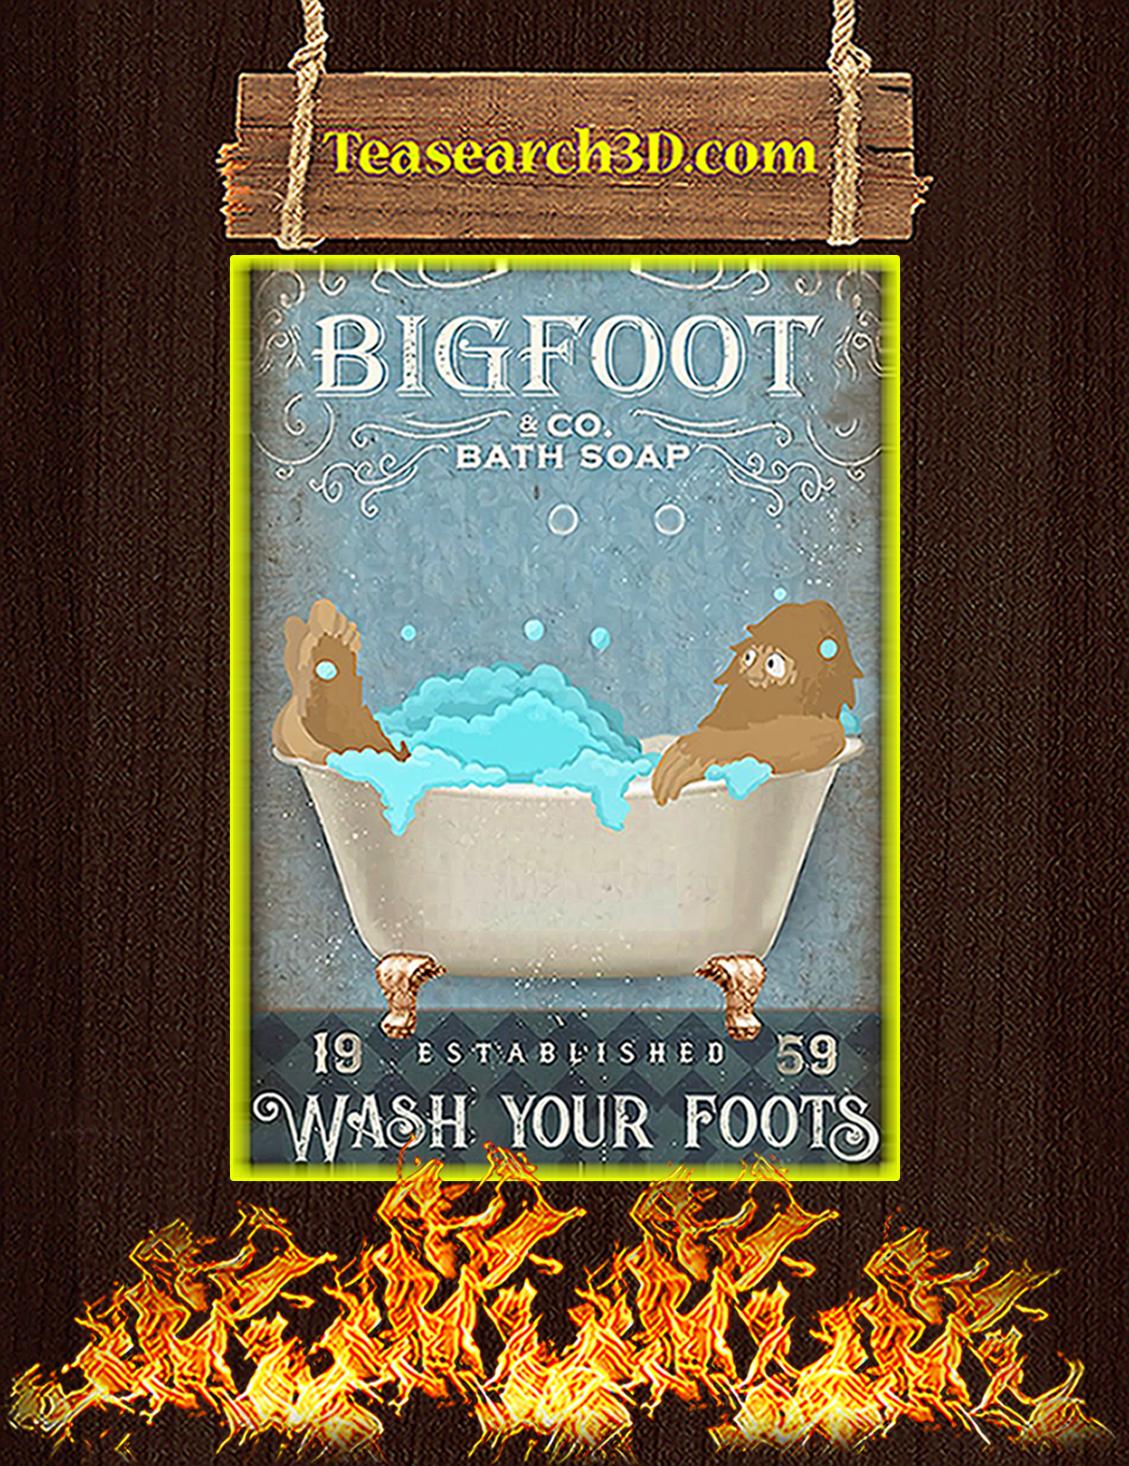 Bigfoot bath soap co wash your foots poster A3